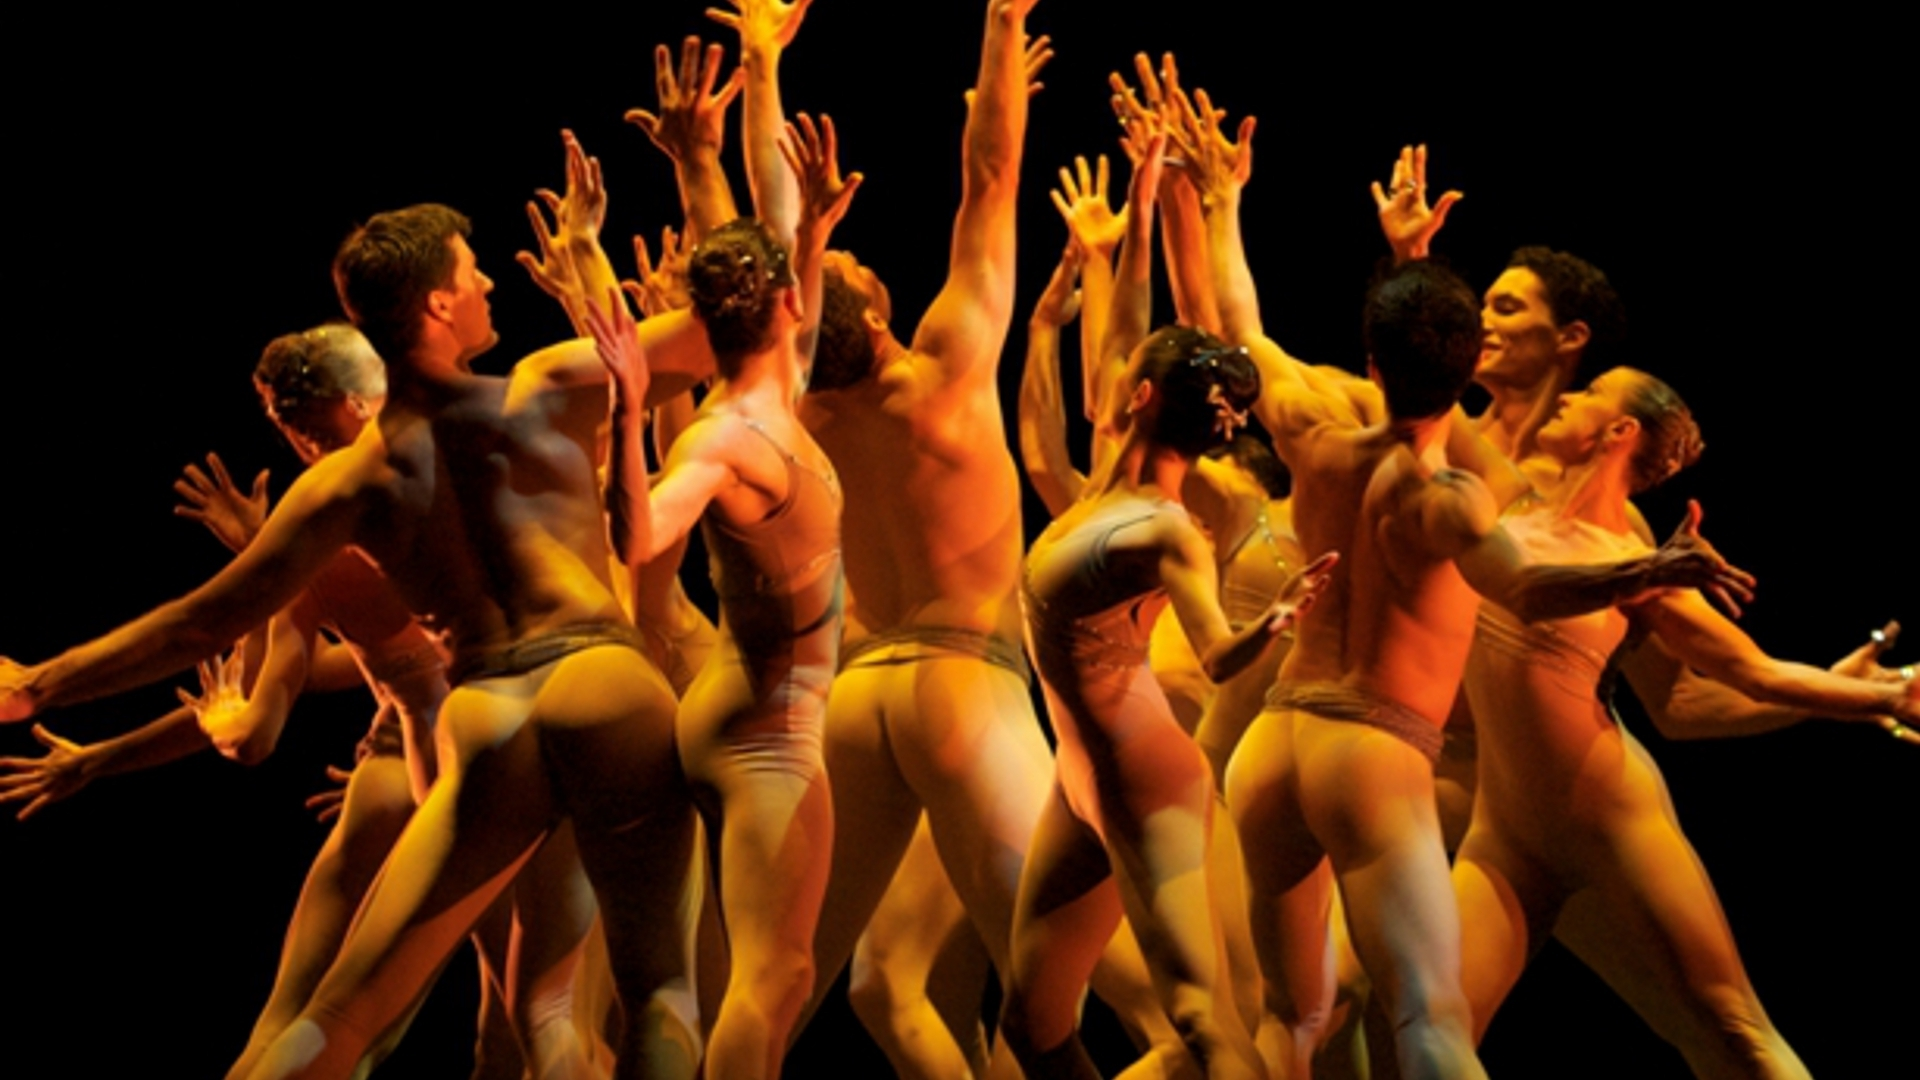 танцы голые артисты такой холодный